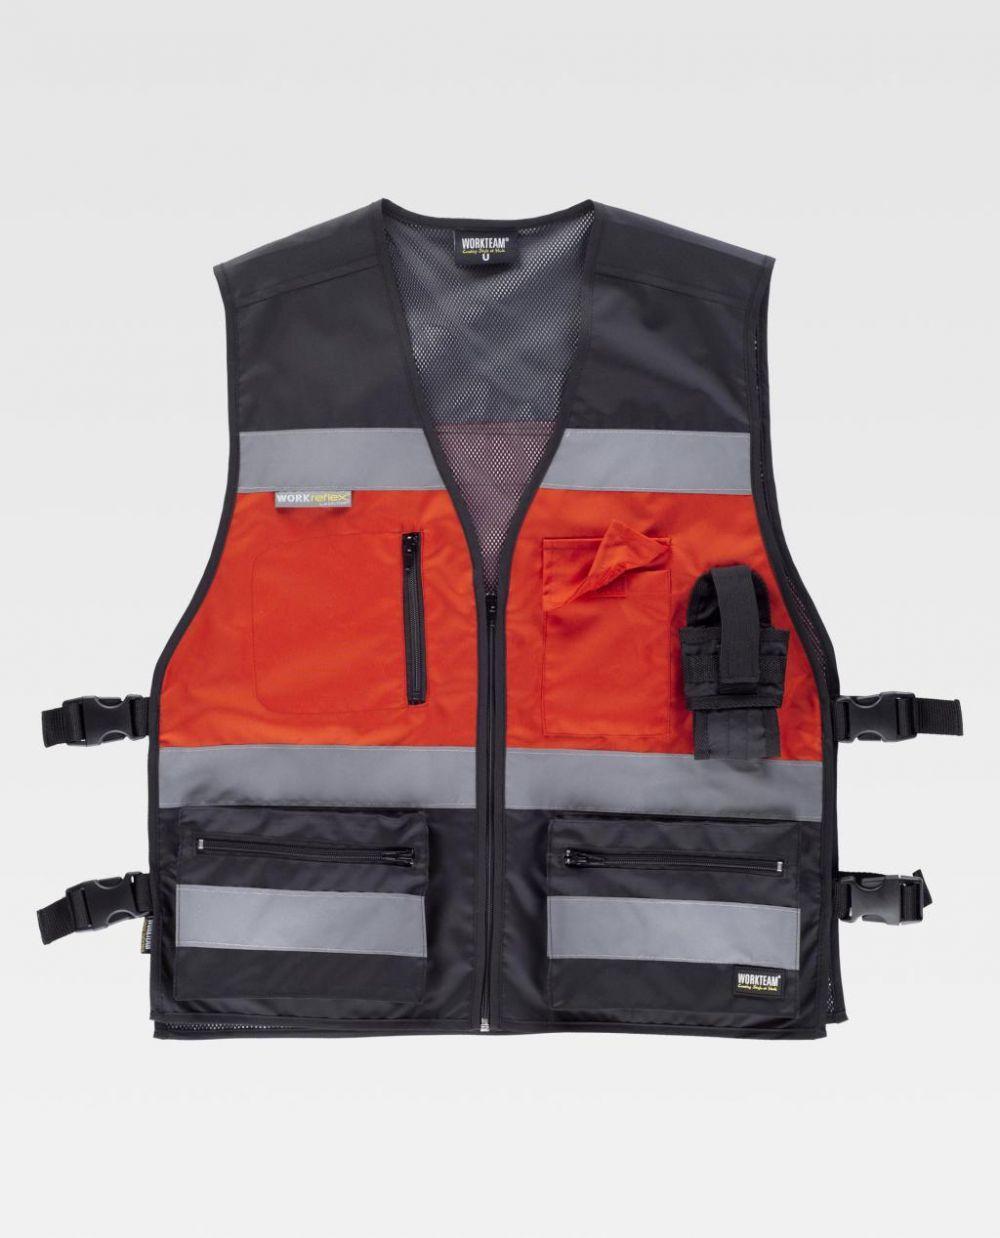 Chalecos reflectantes workteam tejido oxford ajustes laterales de poliéster para personalizar vista 1